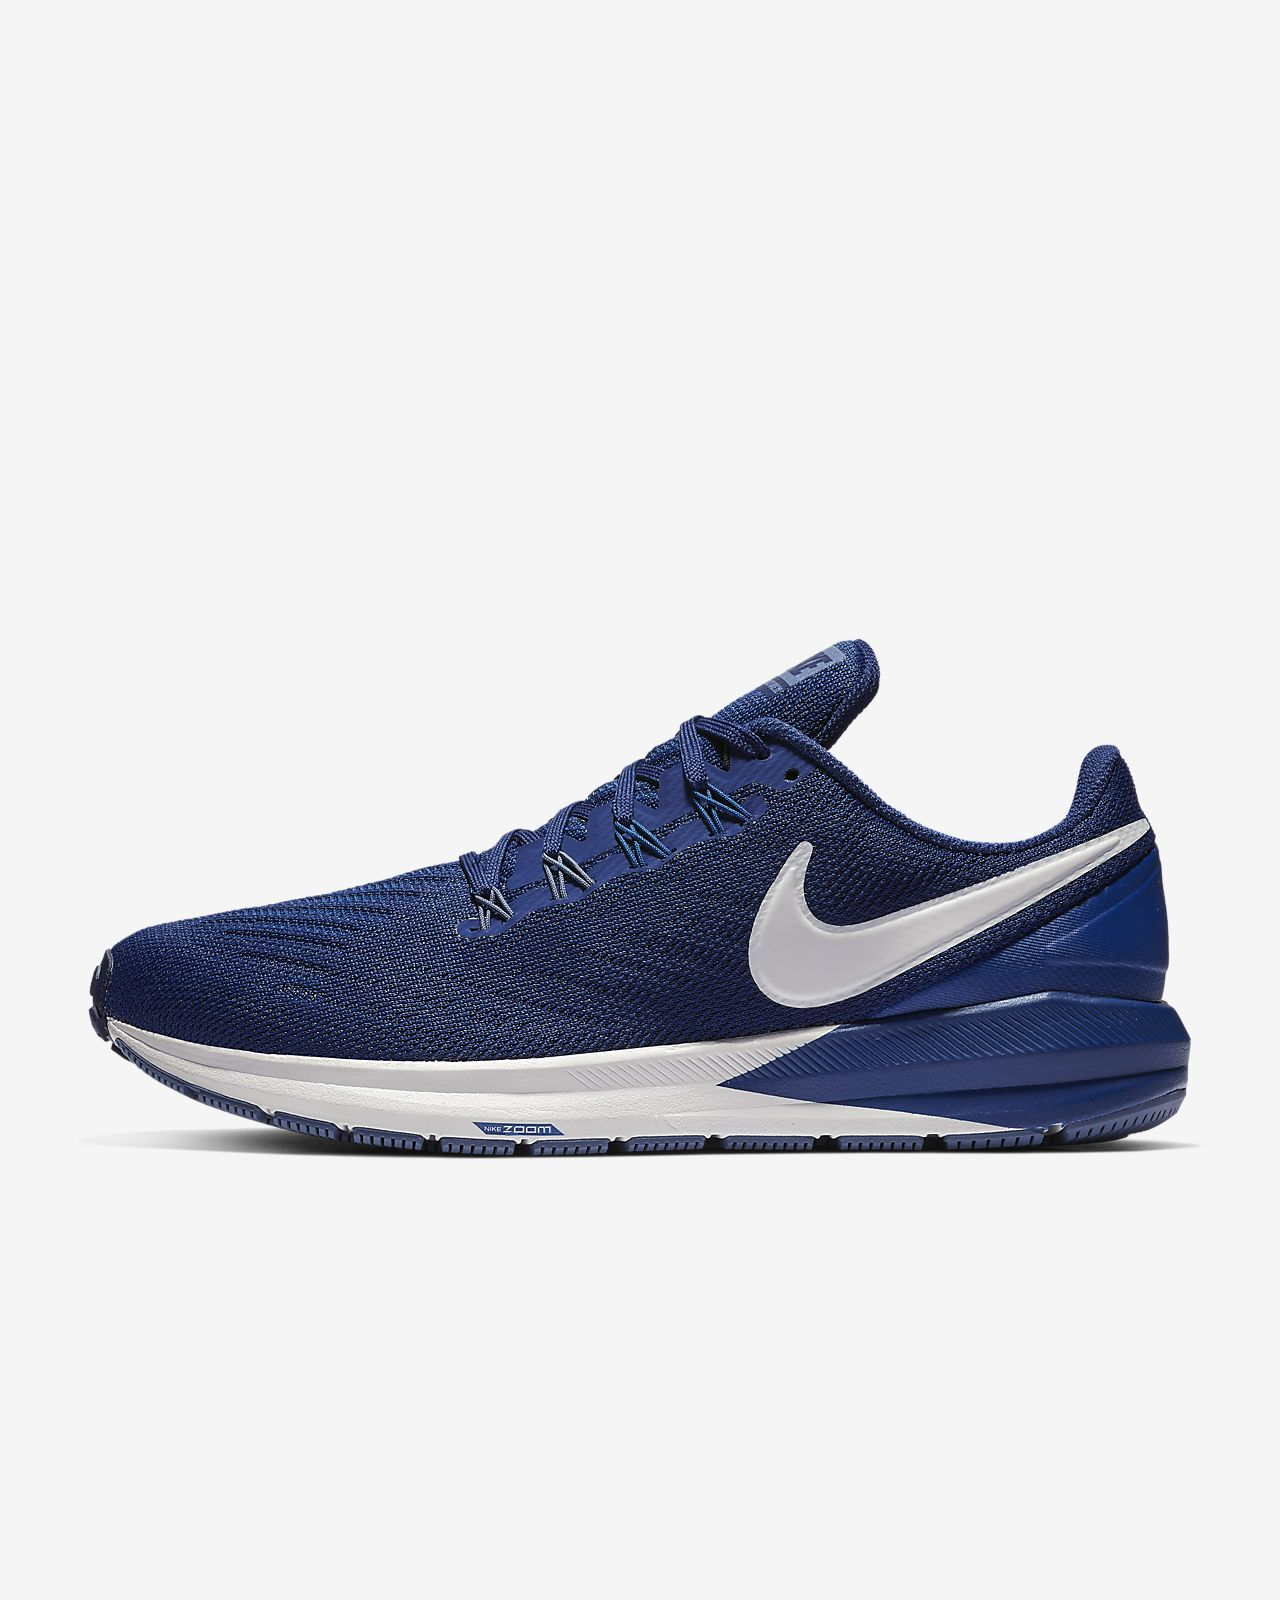 Мужские беговые кроссовки Nike Air Zoom Structure 22 (на узкую ногу)